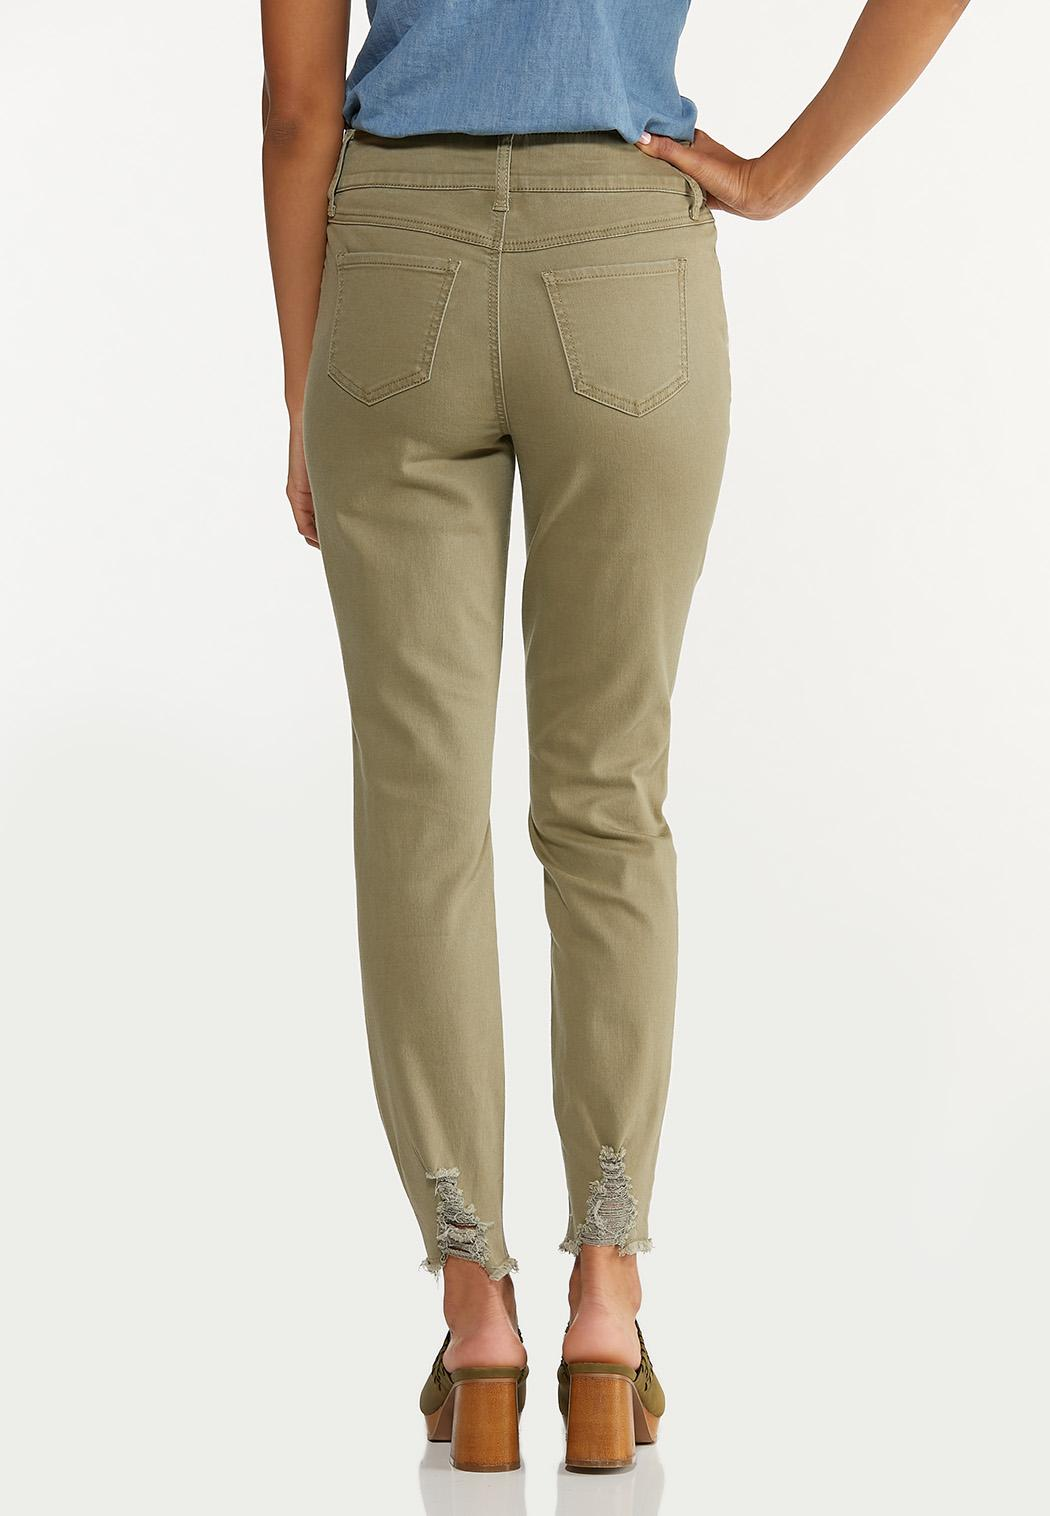 Frayed Olive Pants (Item #44666522)